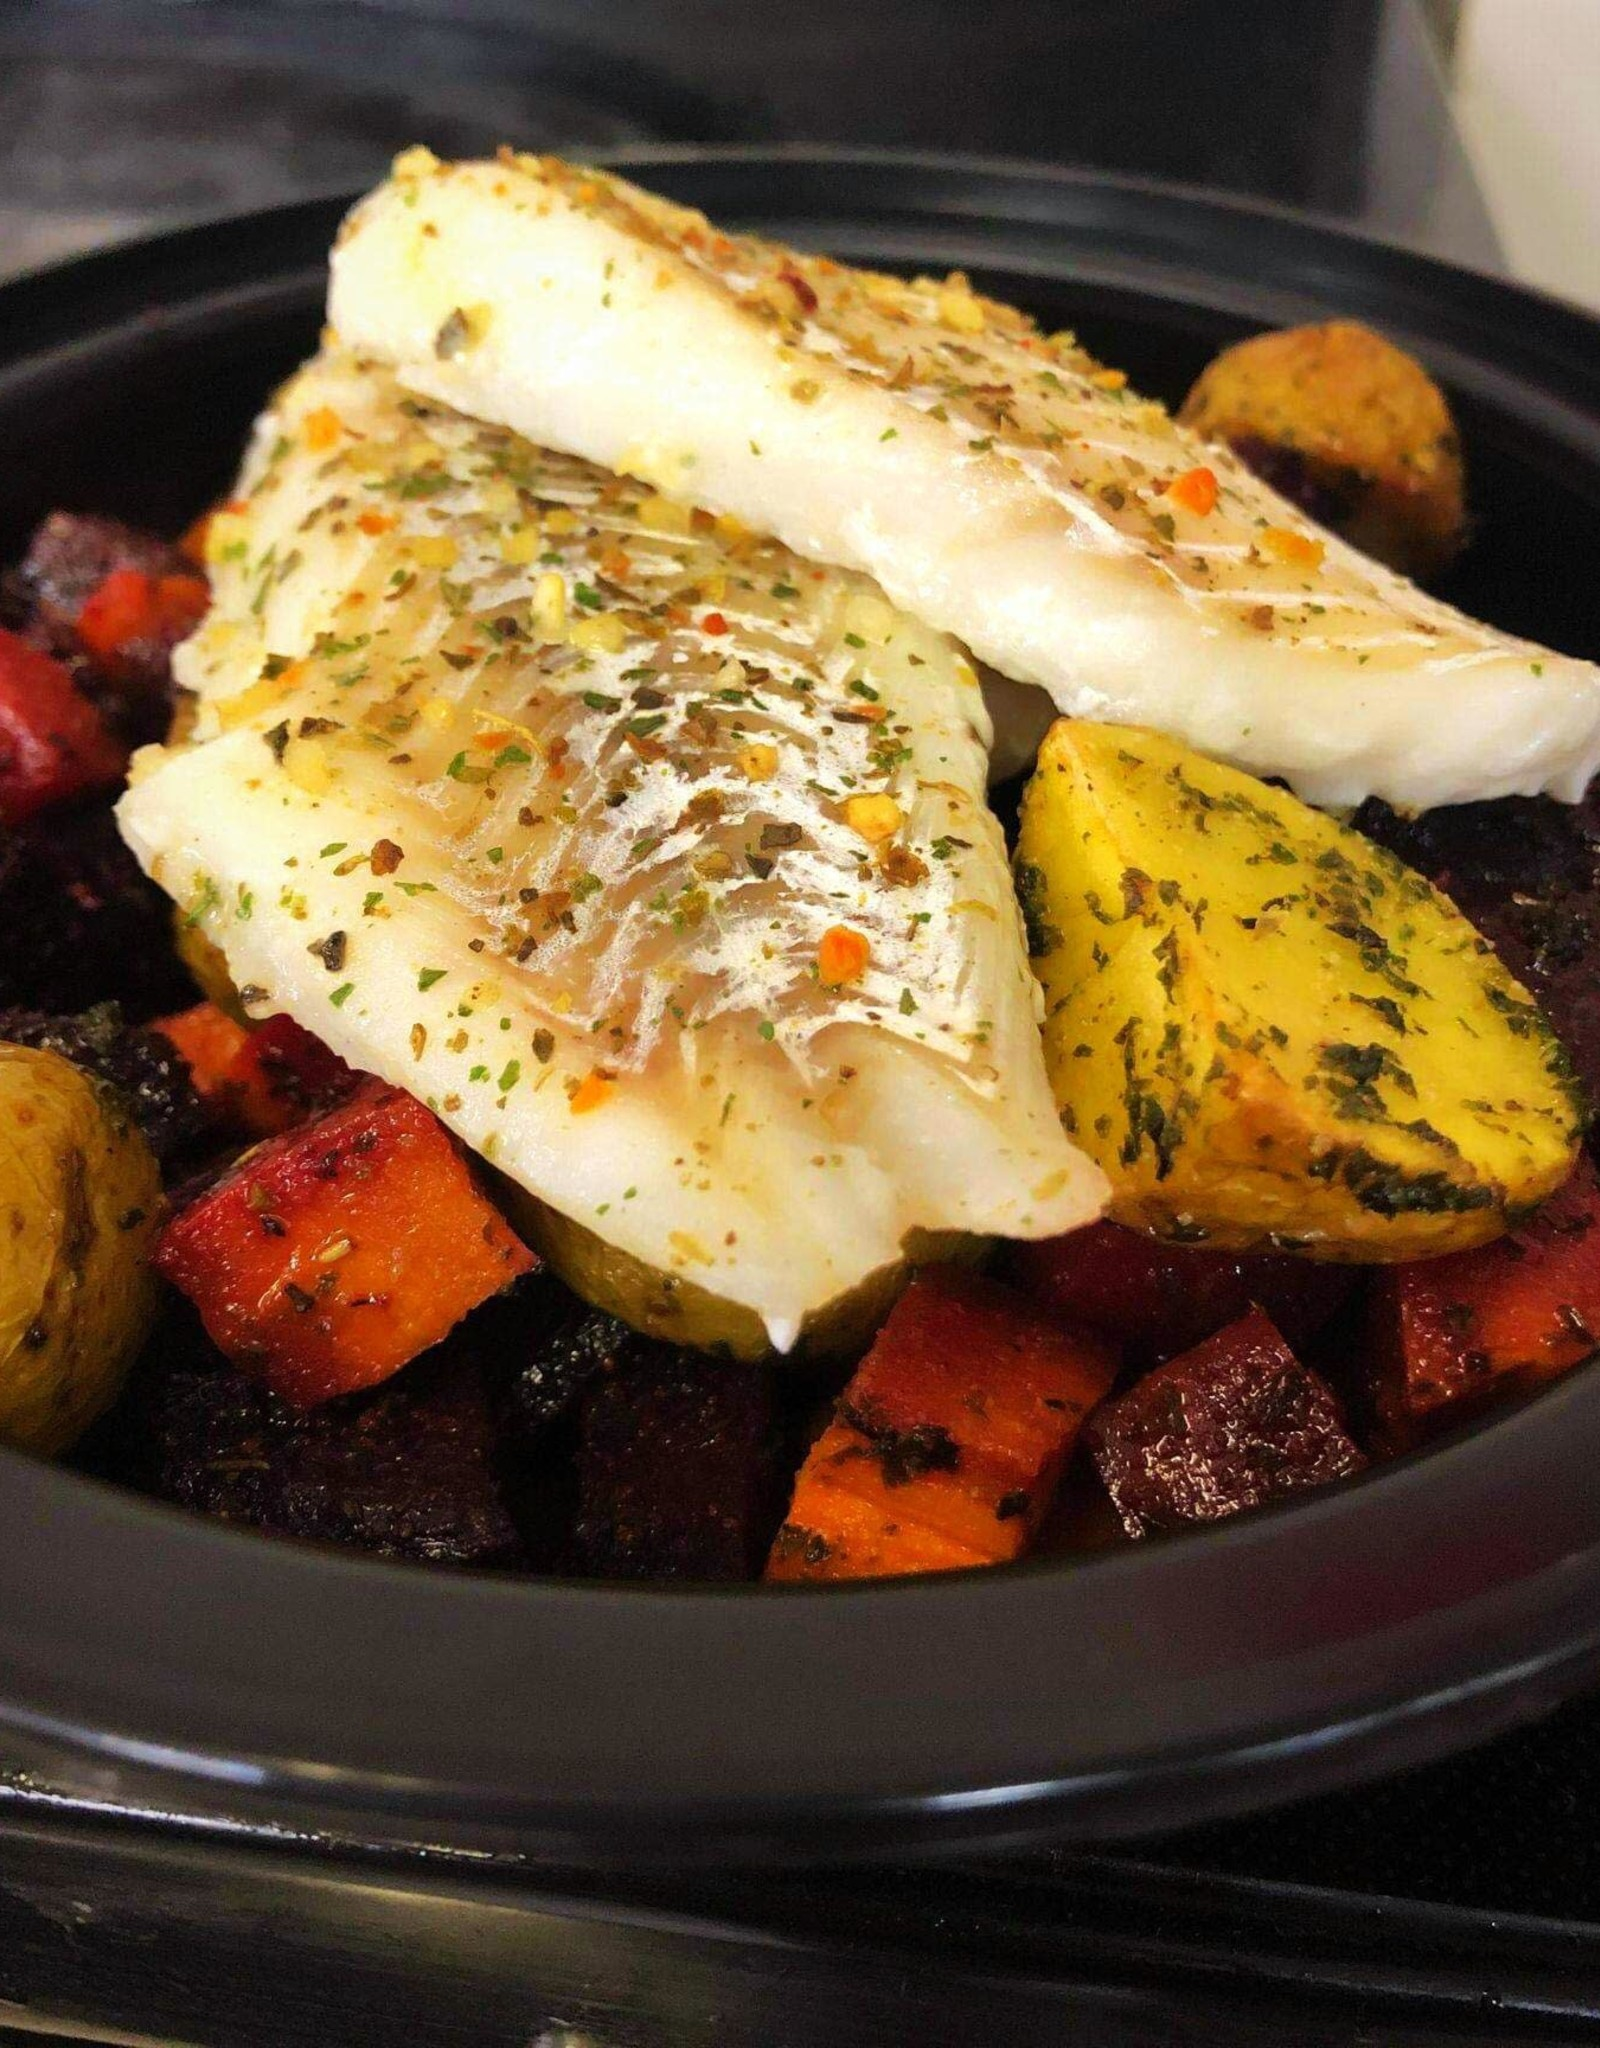 NS Rollies NS Rollies - Meals, Haddock & Roast Veggies